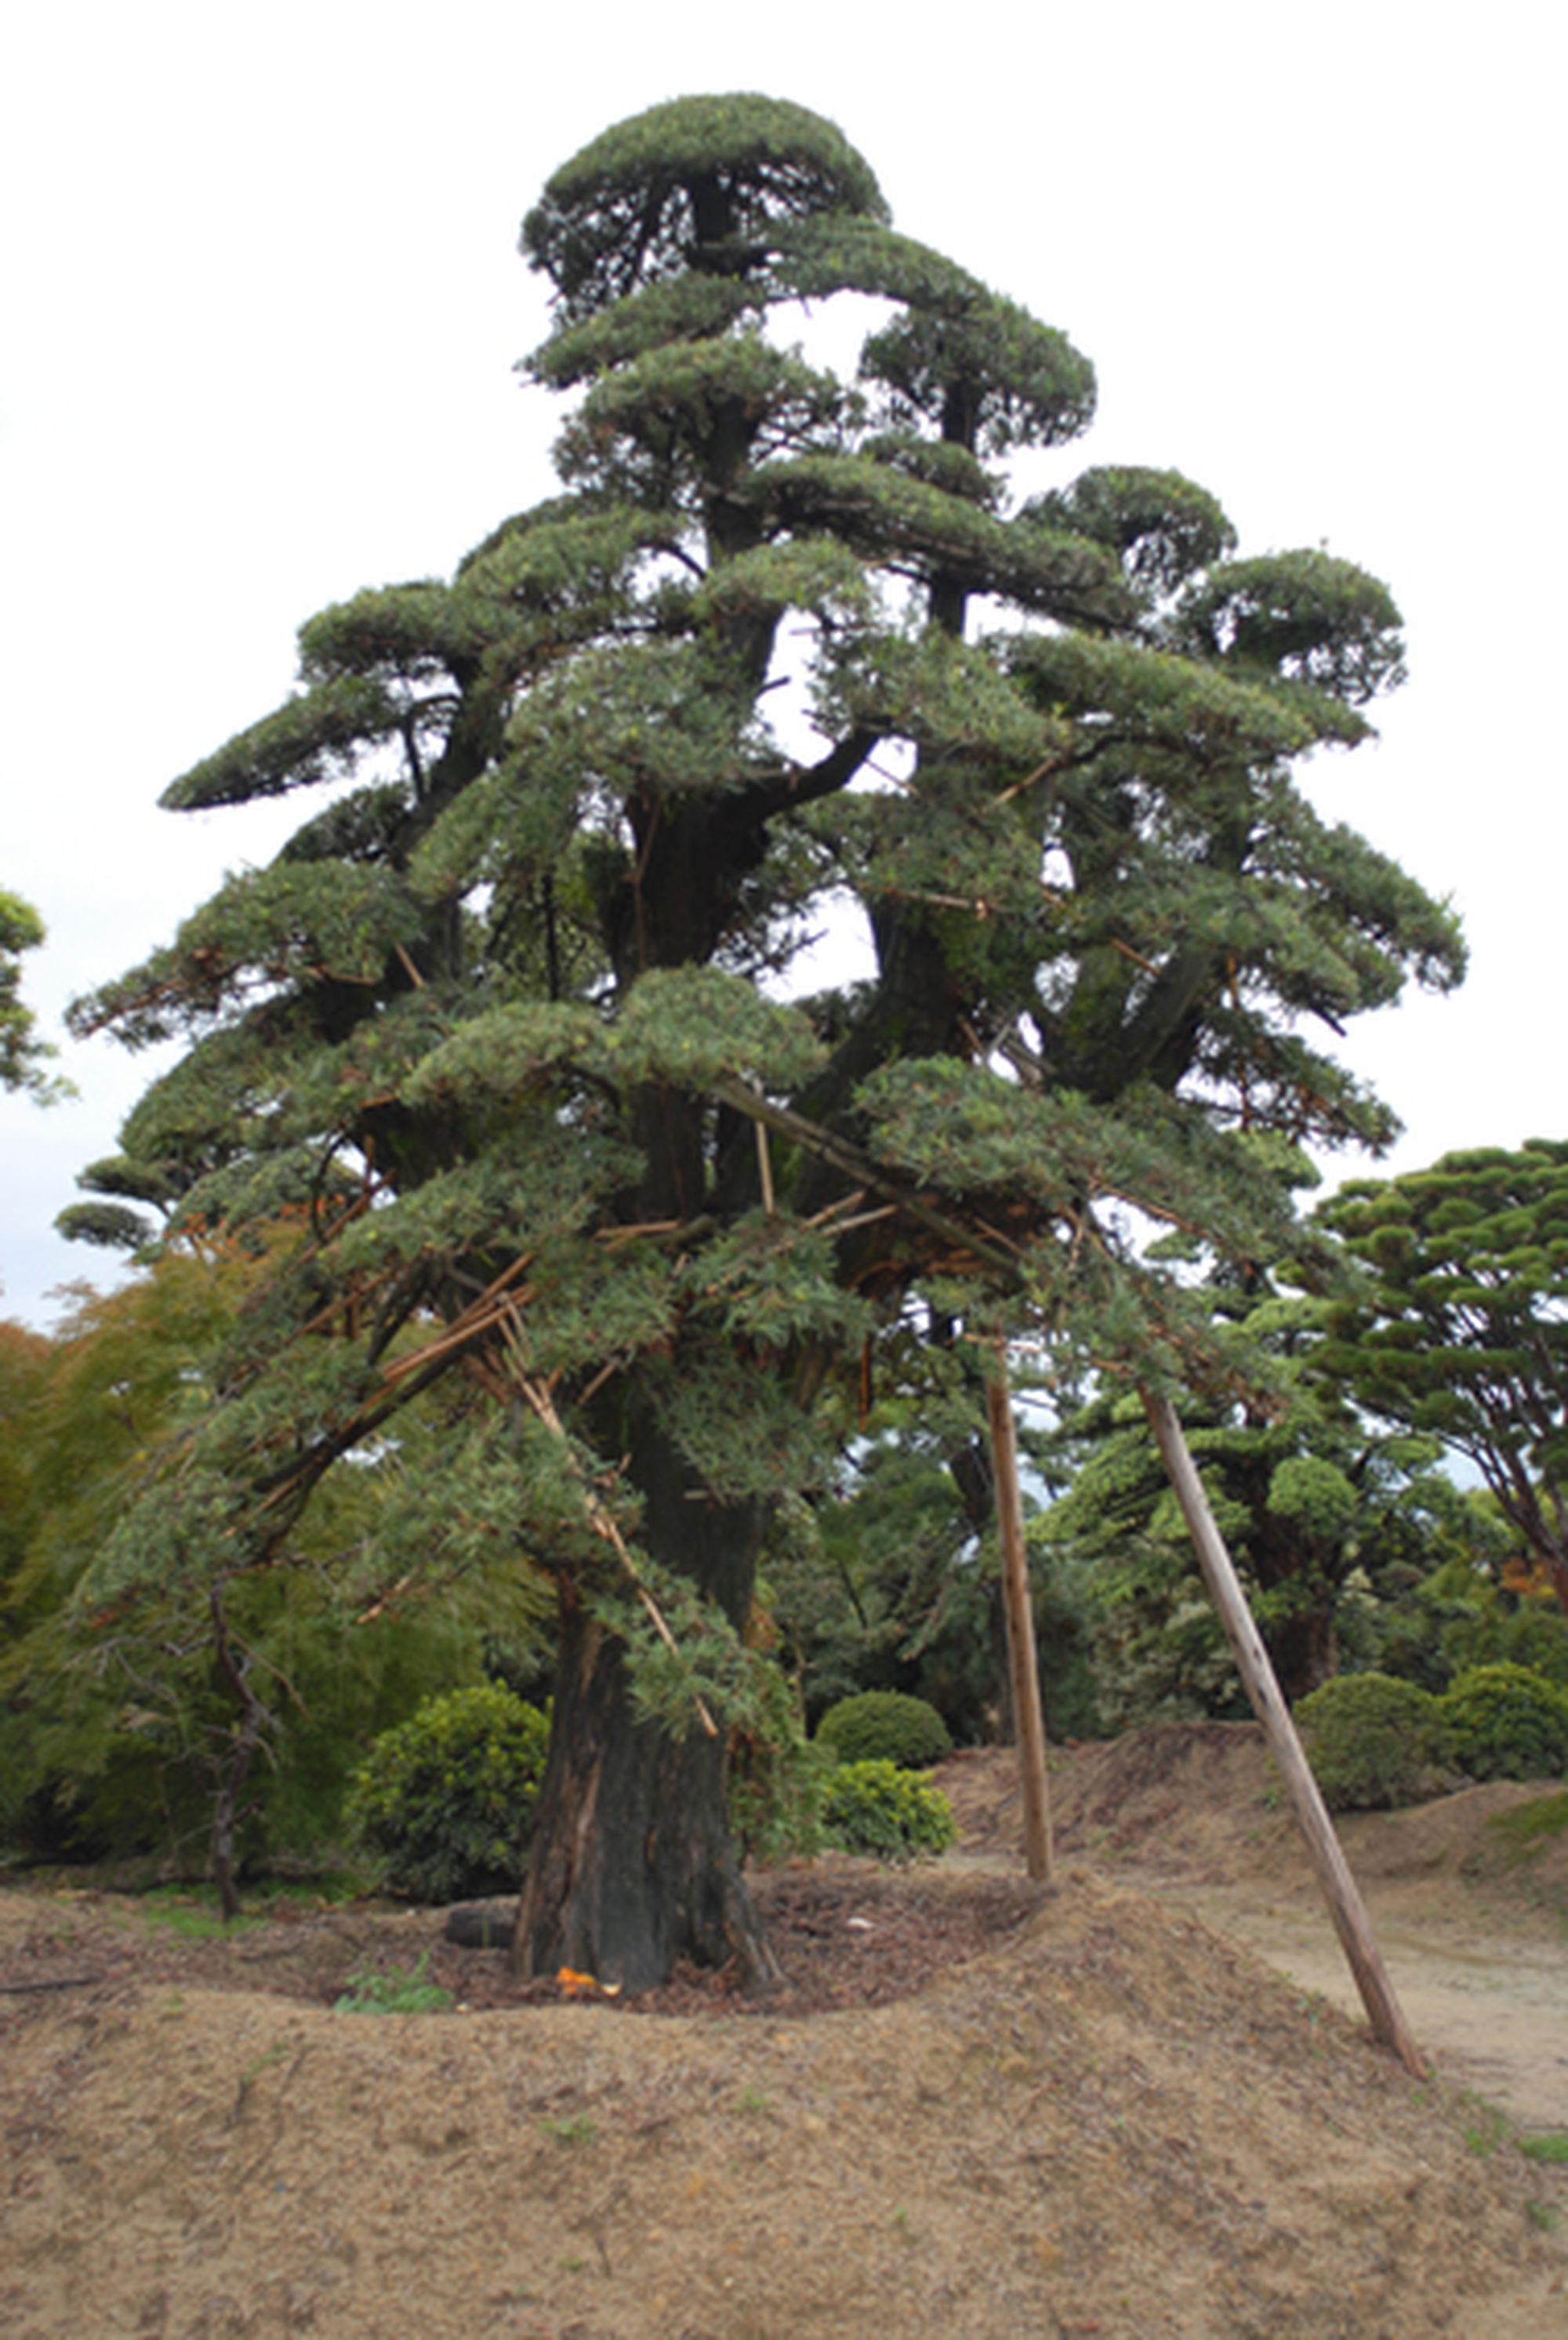 Niwaki More Trees From The Japanese Nursery